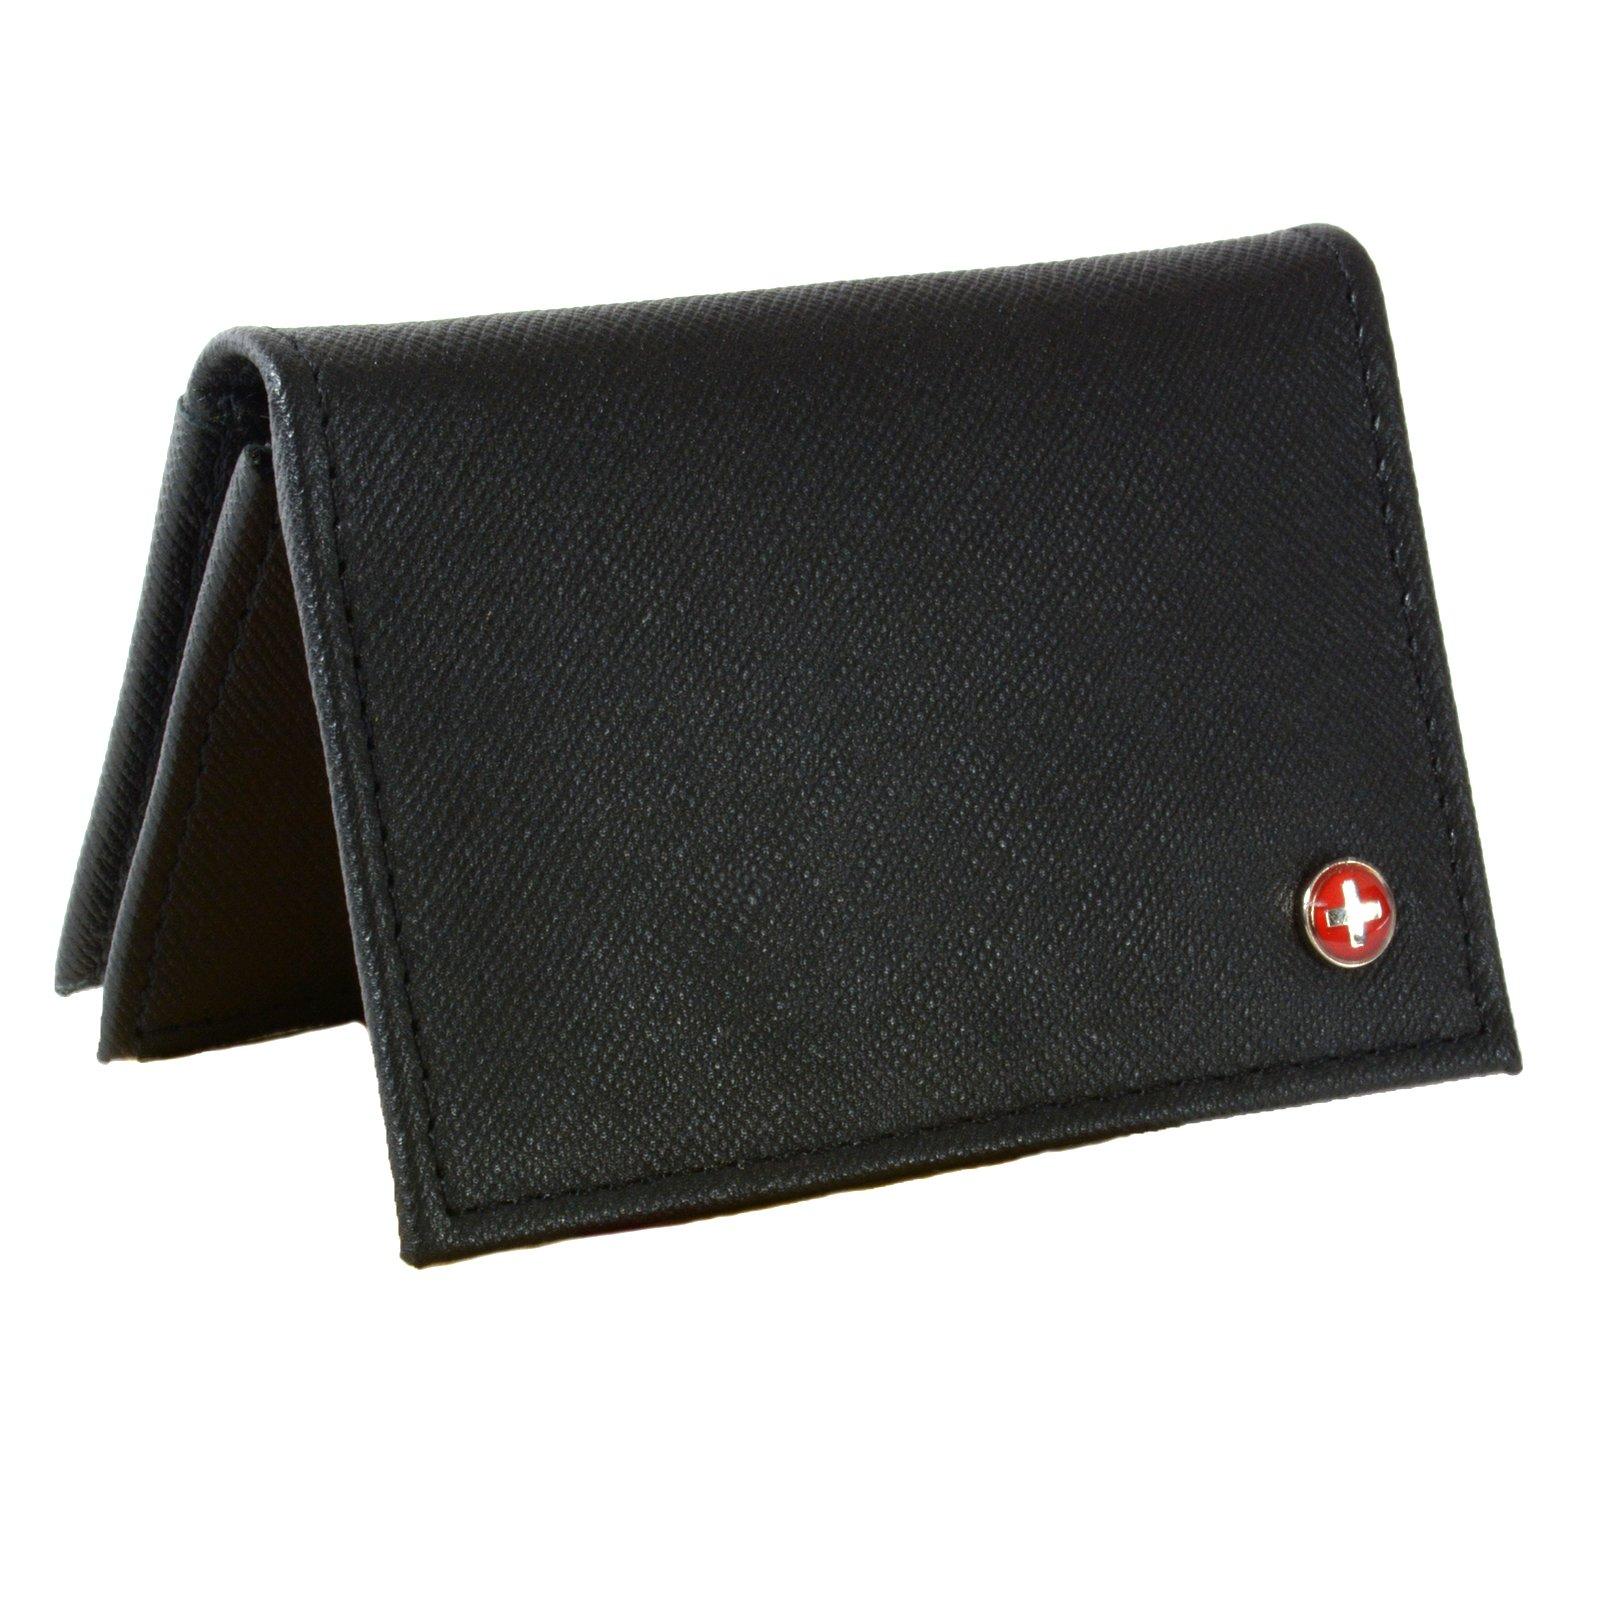 Alpine Swiss Genuine Leather Thin Business Card Case Minimalist Wallet Crosshatch Black